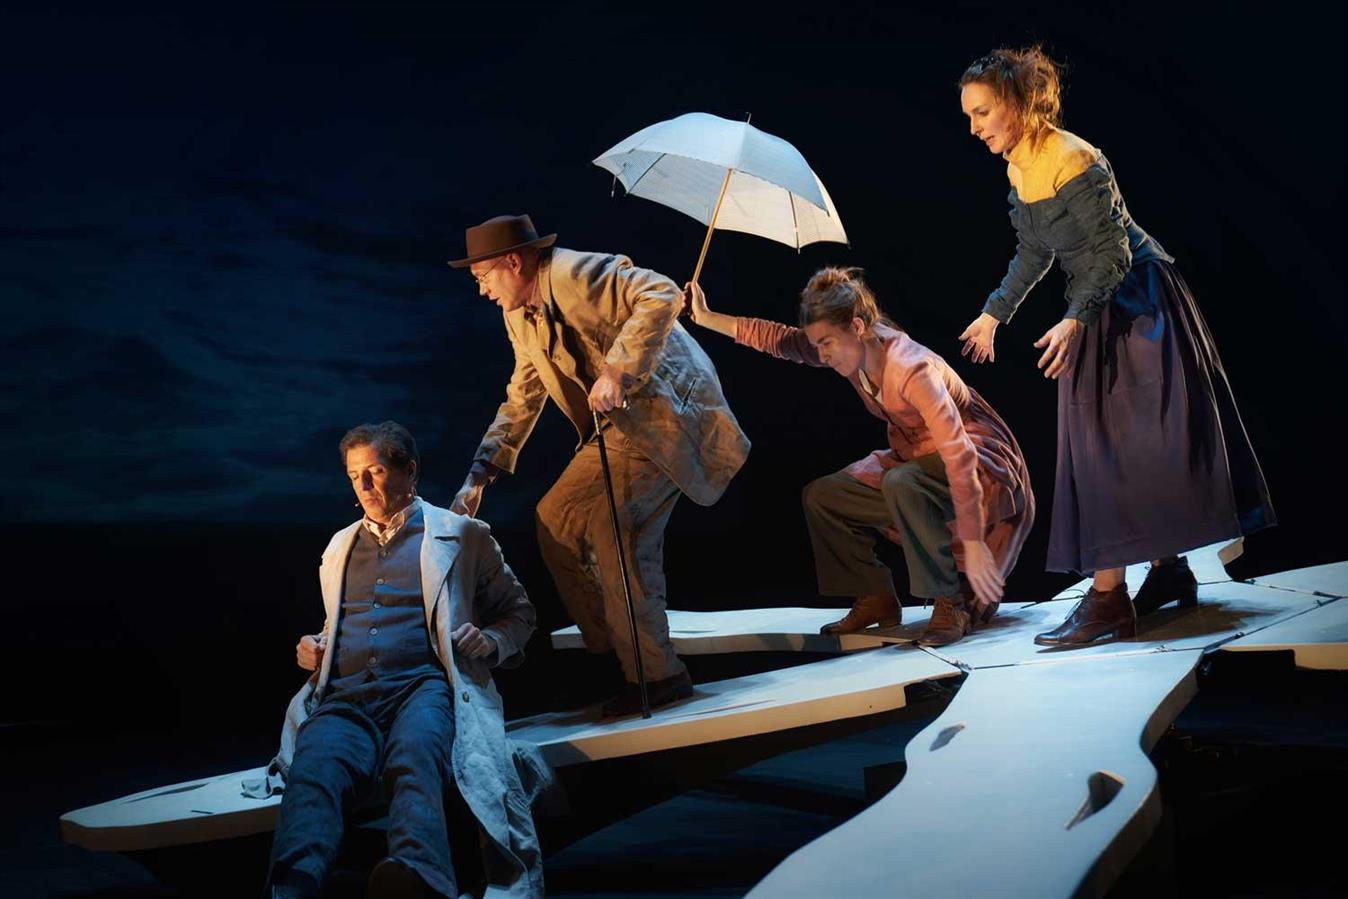 Pan - Rogaland Teater - Director: Arne Nøst - Costume Design: Christina Lovery - Foto: Stig Håvard Dirdal 2018